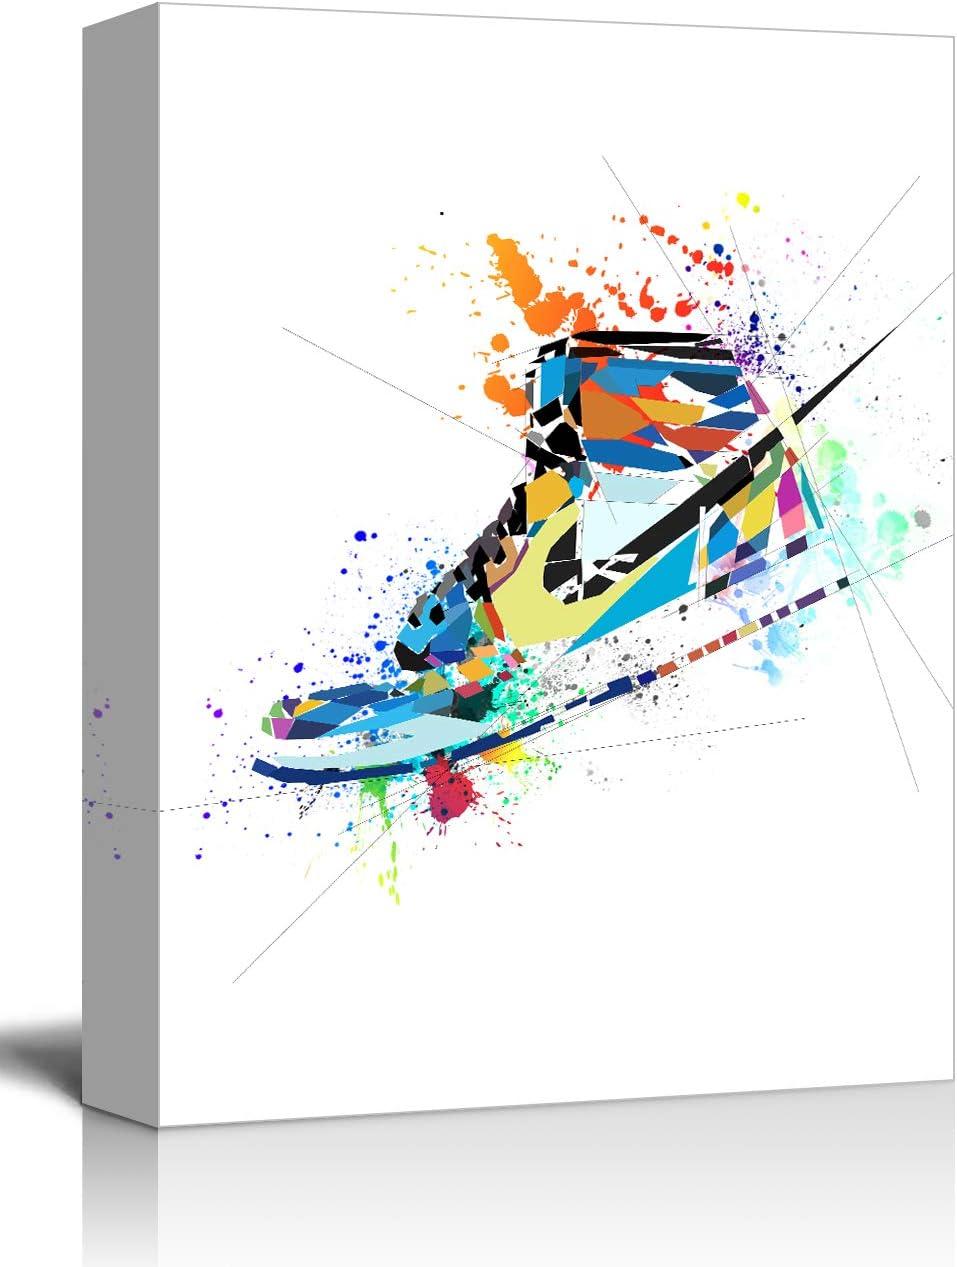 "suwenxia Gym Shoes Canvas Art Sports Themed Wall Art for Boys Room Wall Decor Boys Gift Office Framed Wall Art Room Office Decoration 12""x16"""